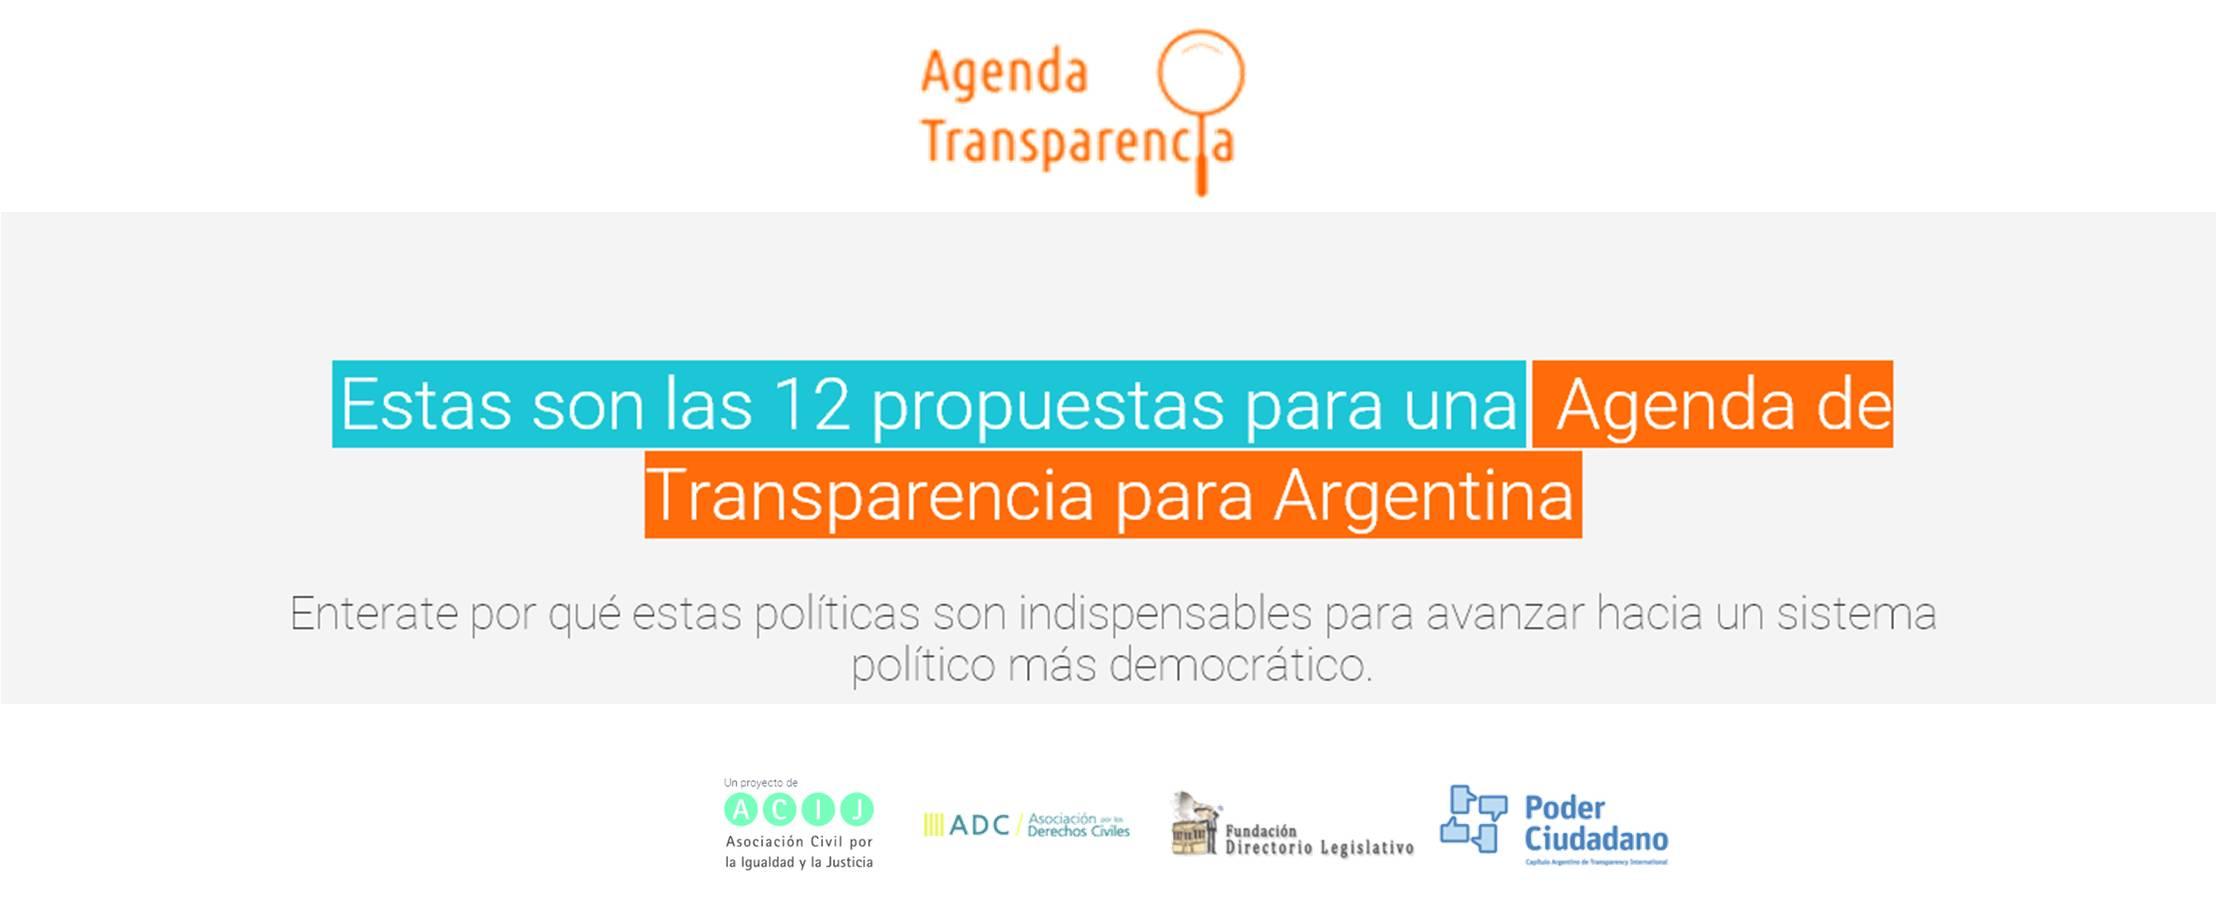 Agenda transparencia flyer